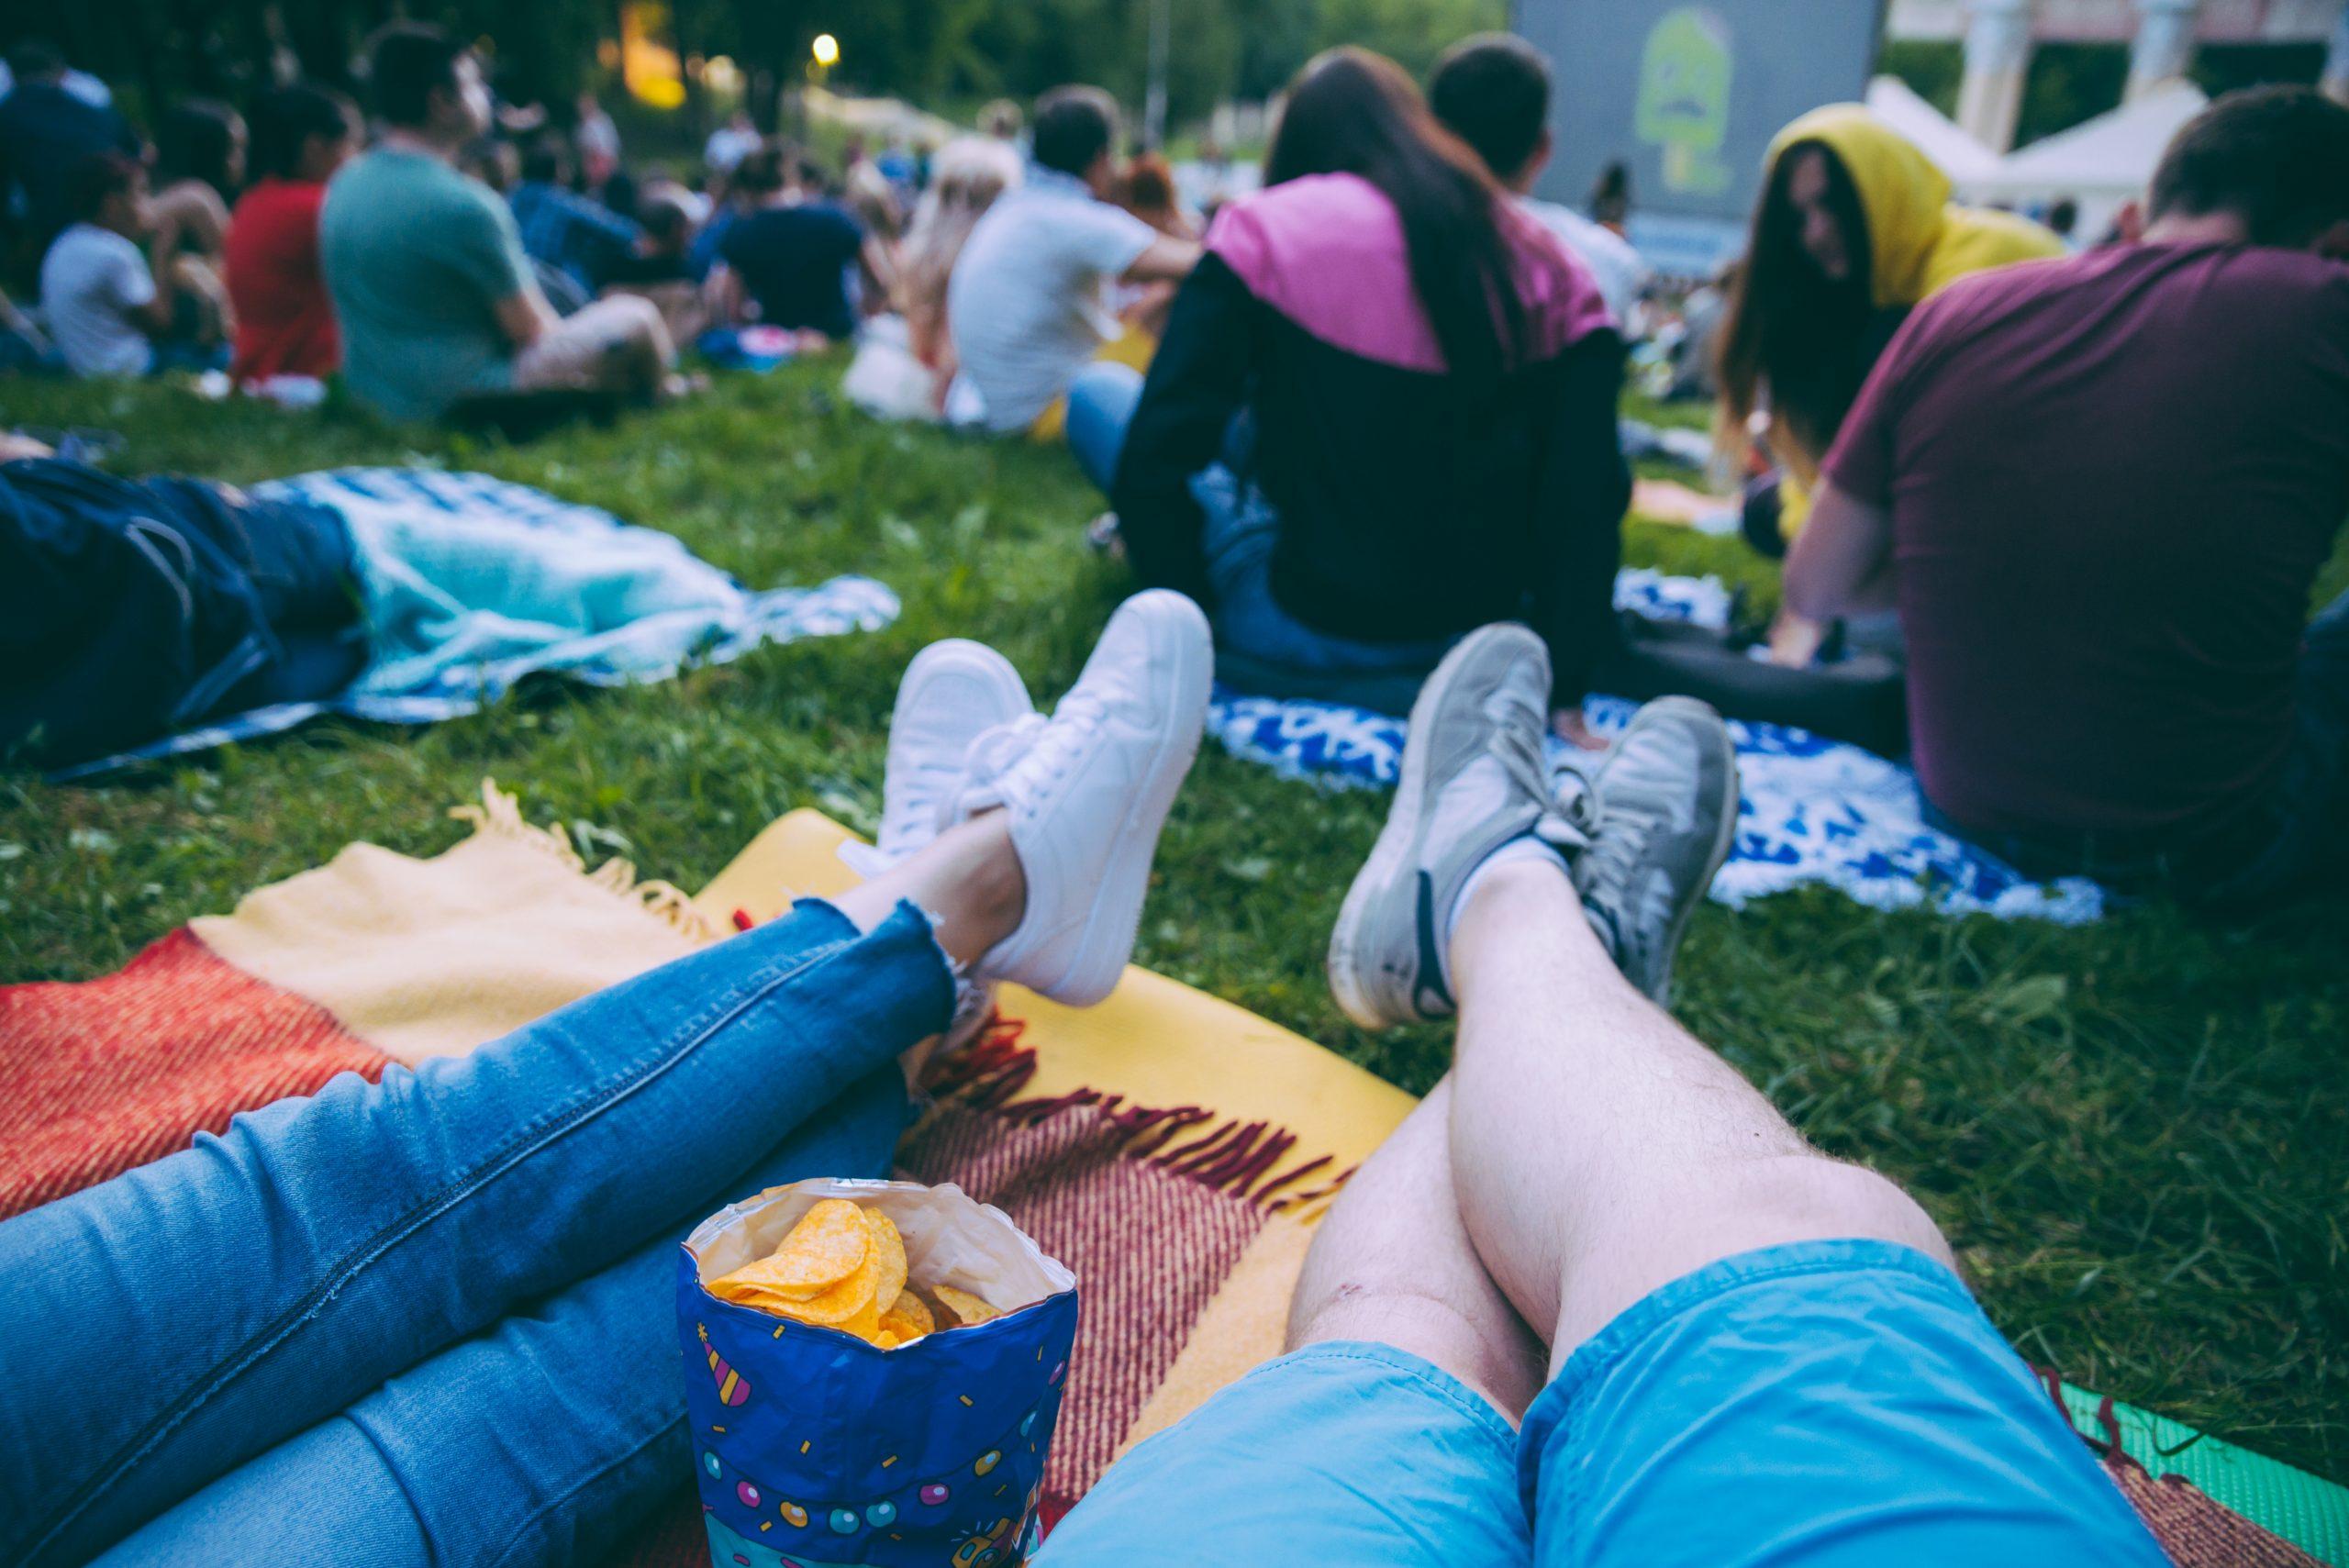 People,Watching,Movie,In,Open,Air,Cinema,In,City,Park